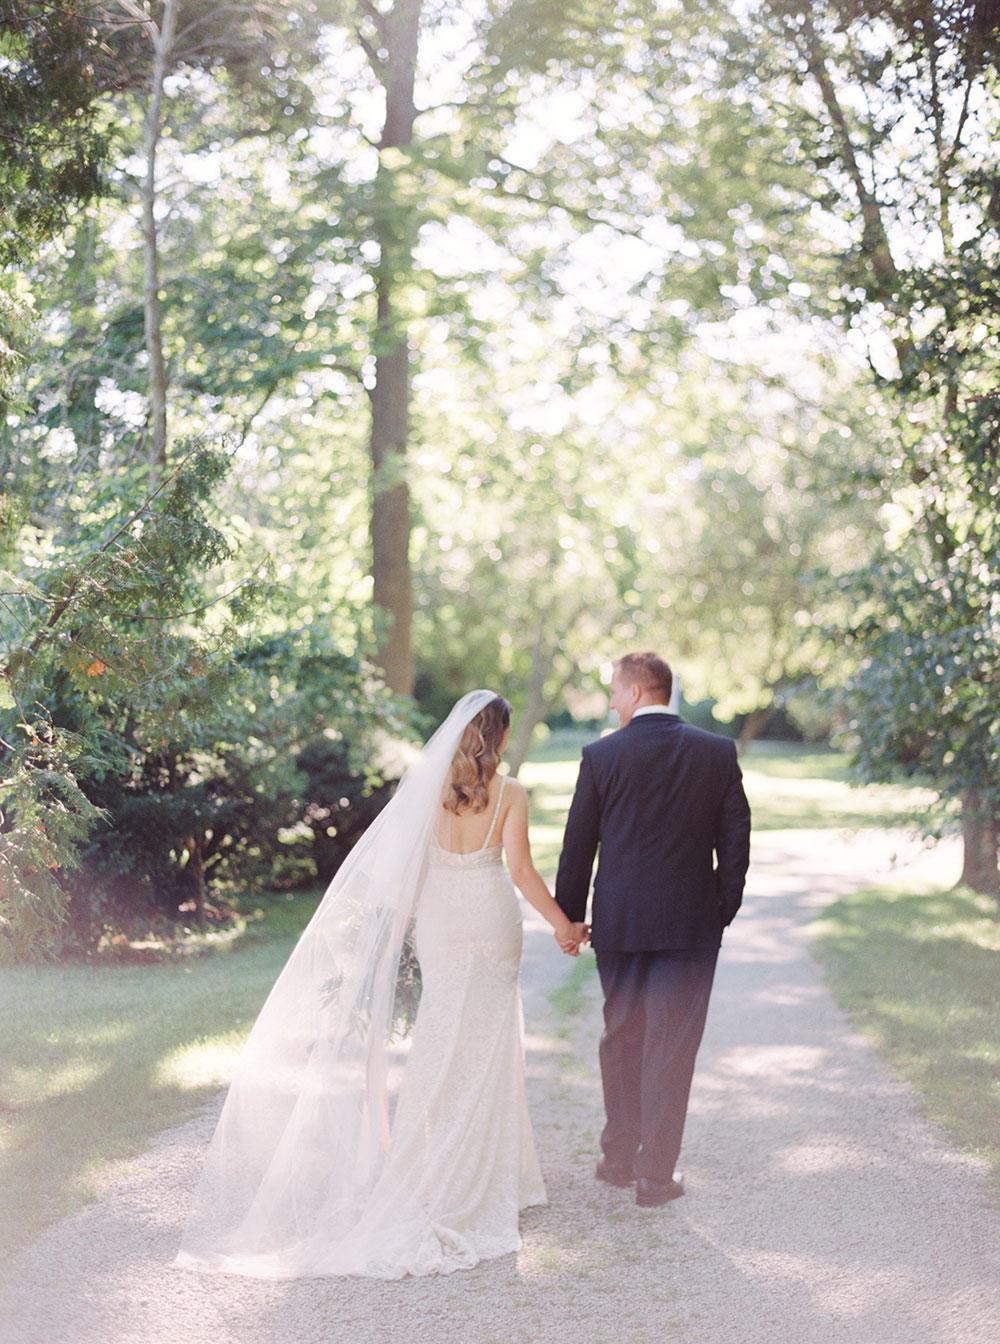 kurtz-orchards-wedding-gracewood-estate-niagara-on-the-lake-photo-by-katie-nicolle-photography-0064.JPG